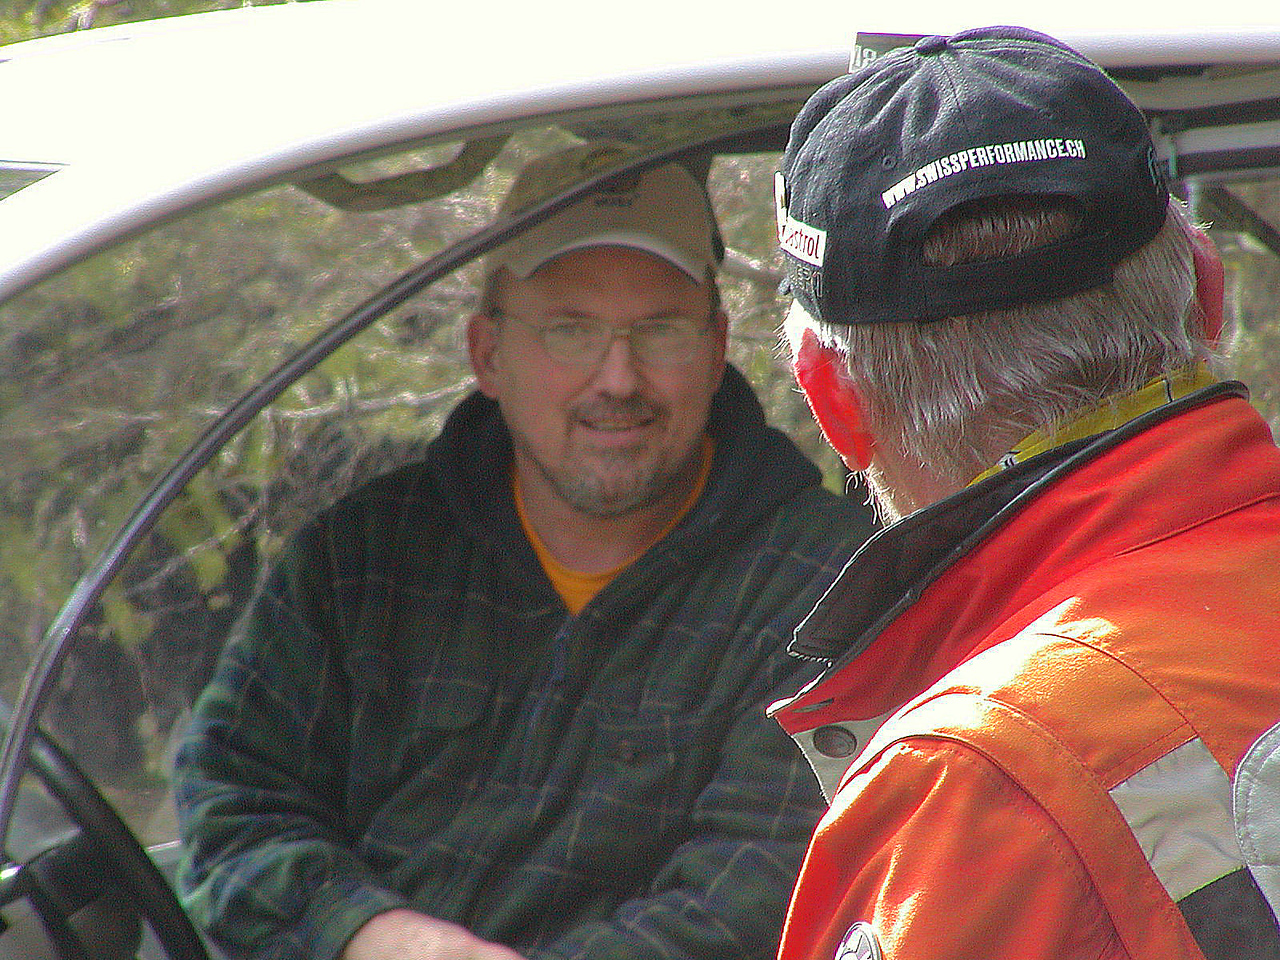 Camp host negotiating camping fees